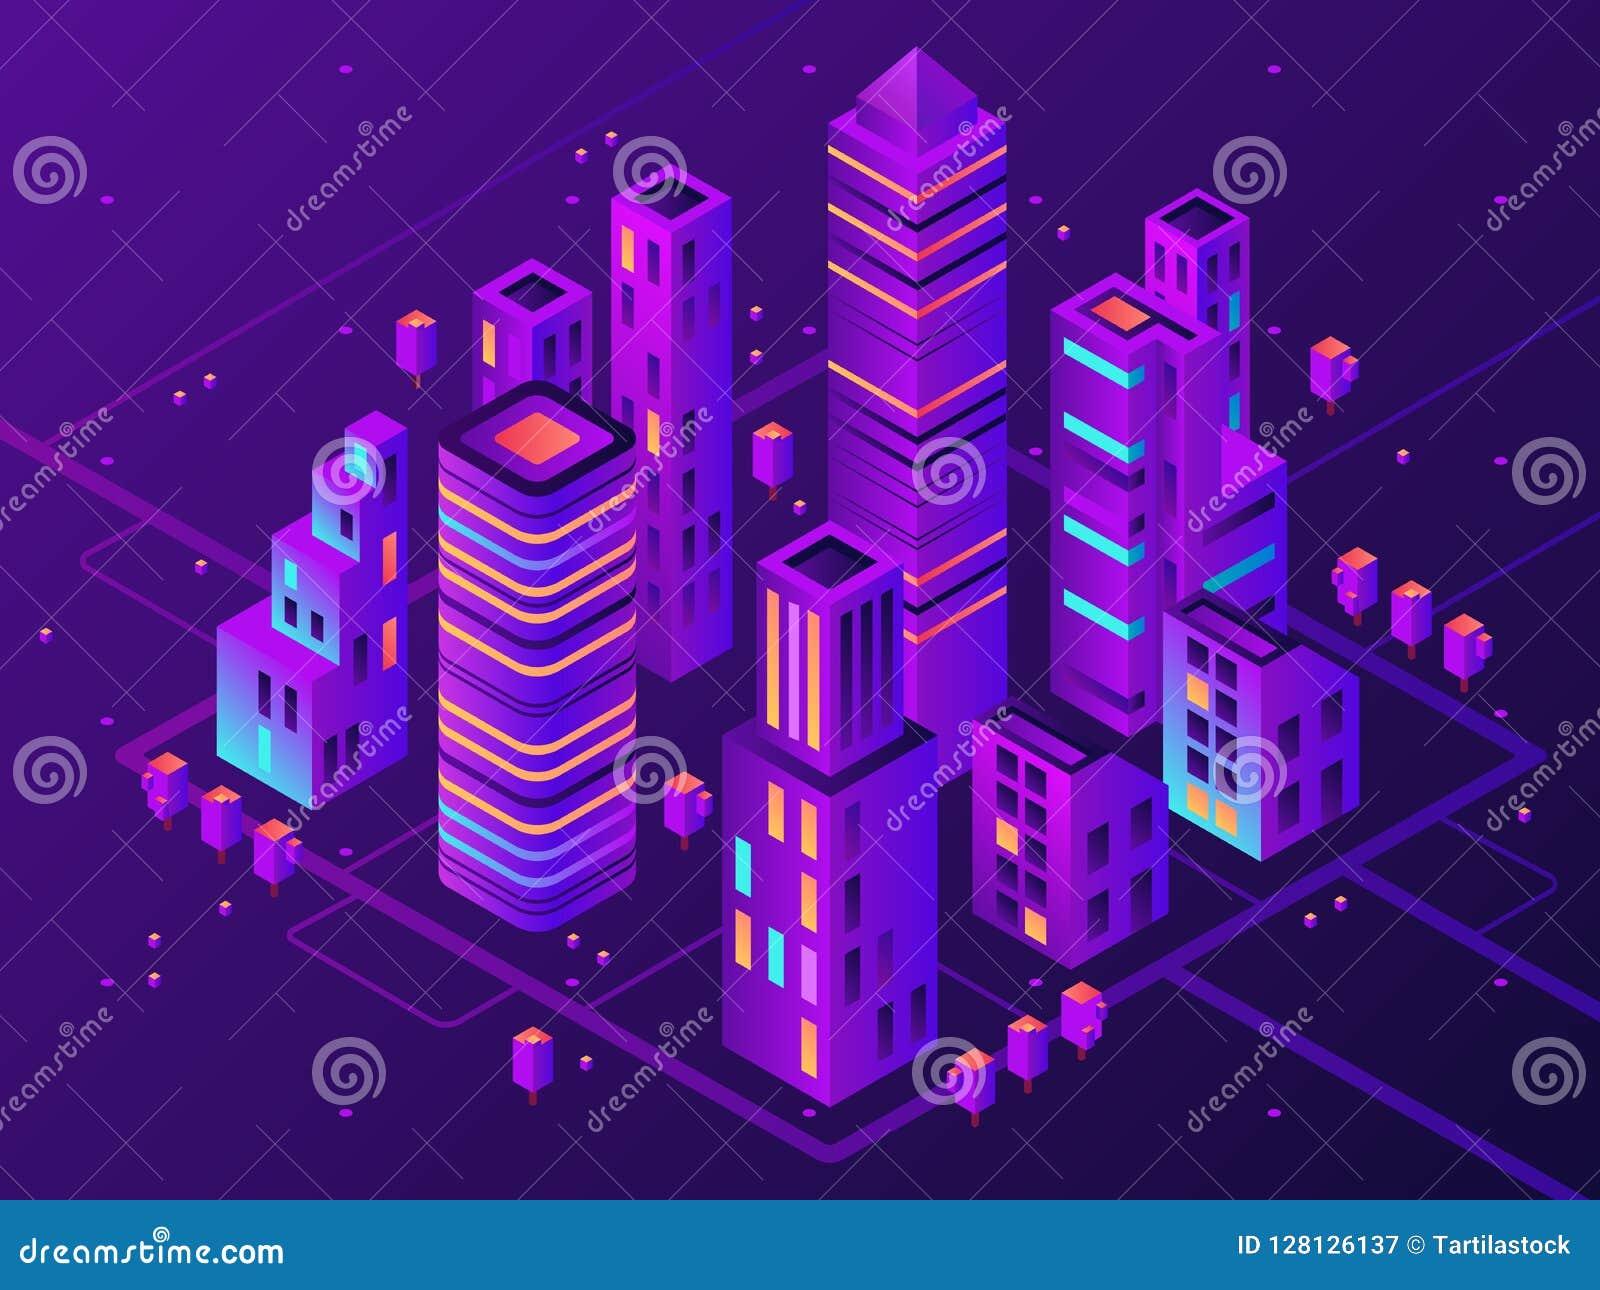 Isometric neon town. Futuristic illuminated city, future megapolis highway illumination and business district 3d vector